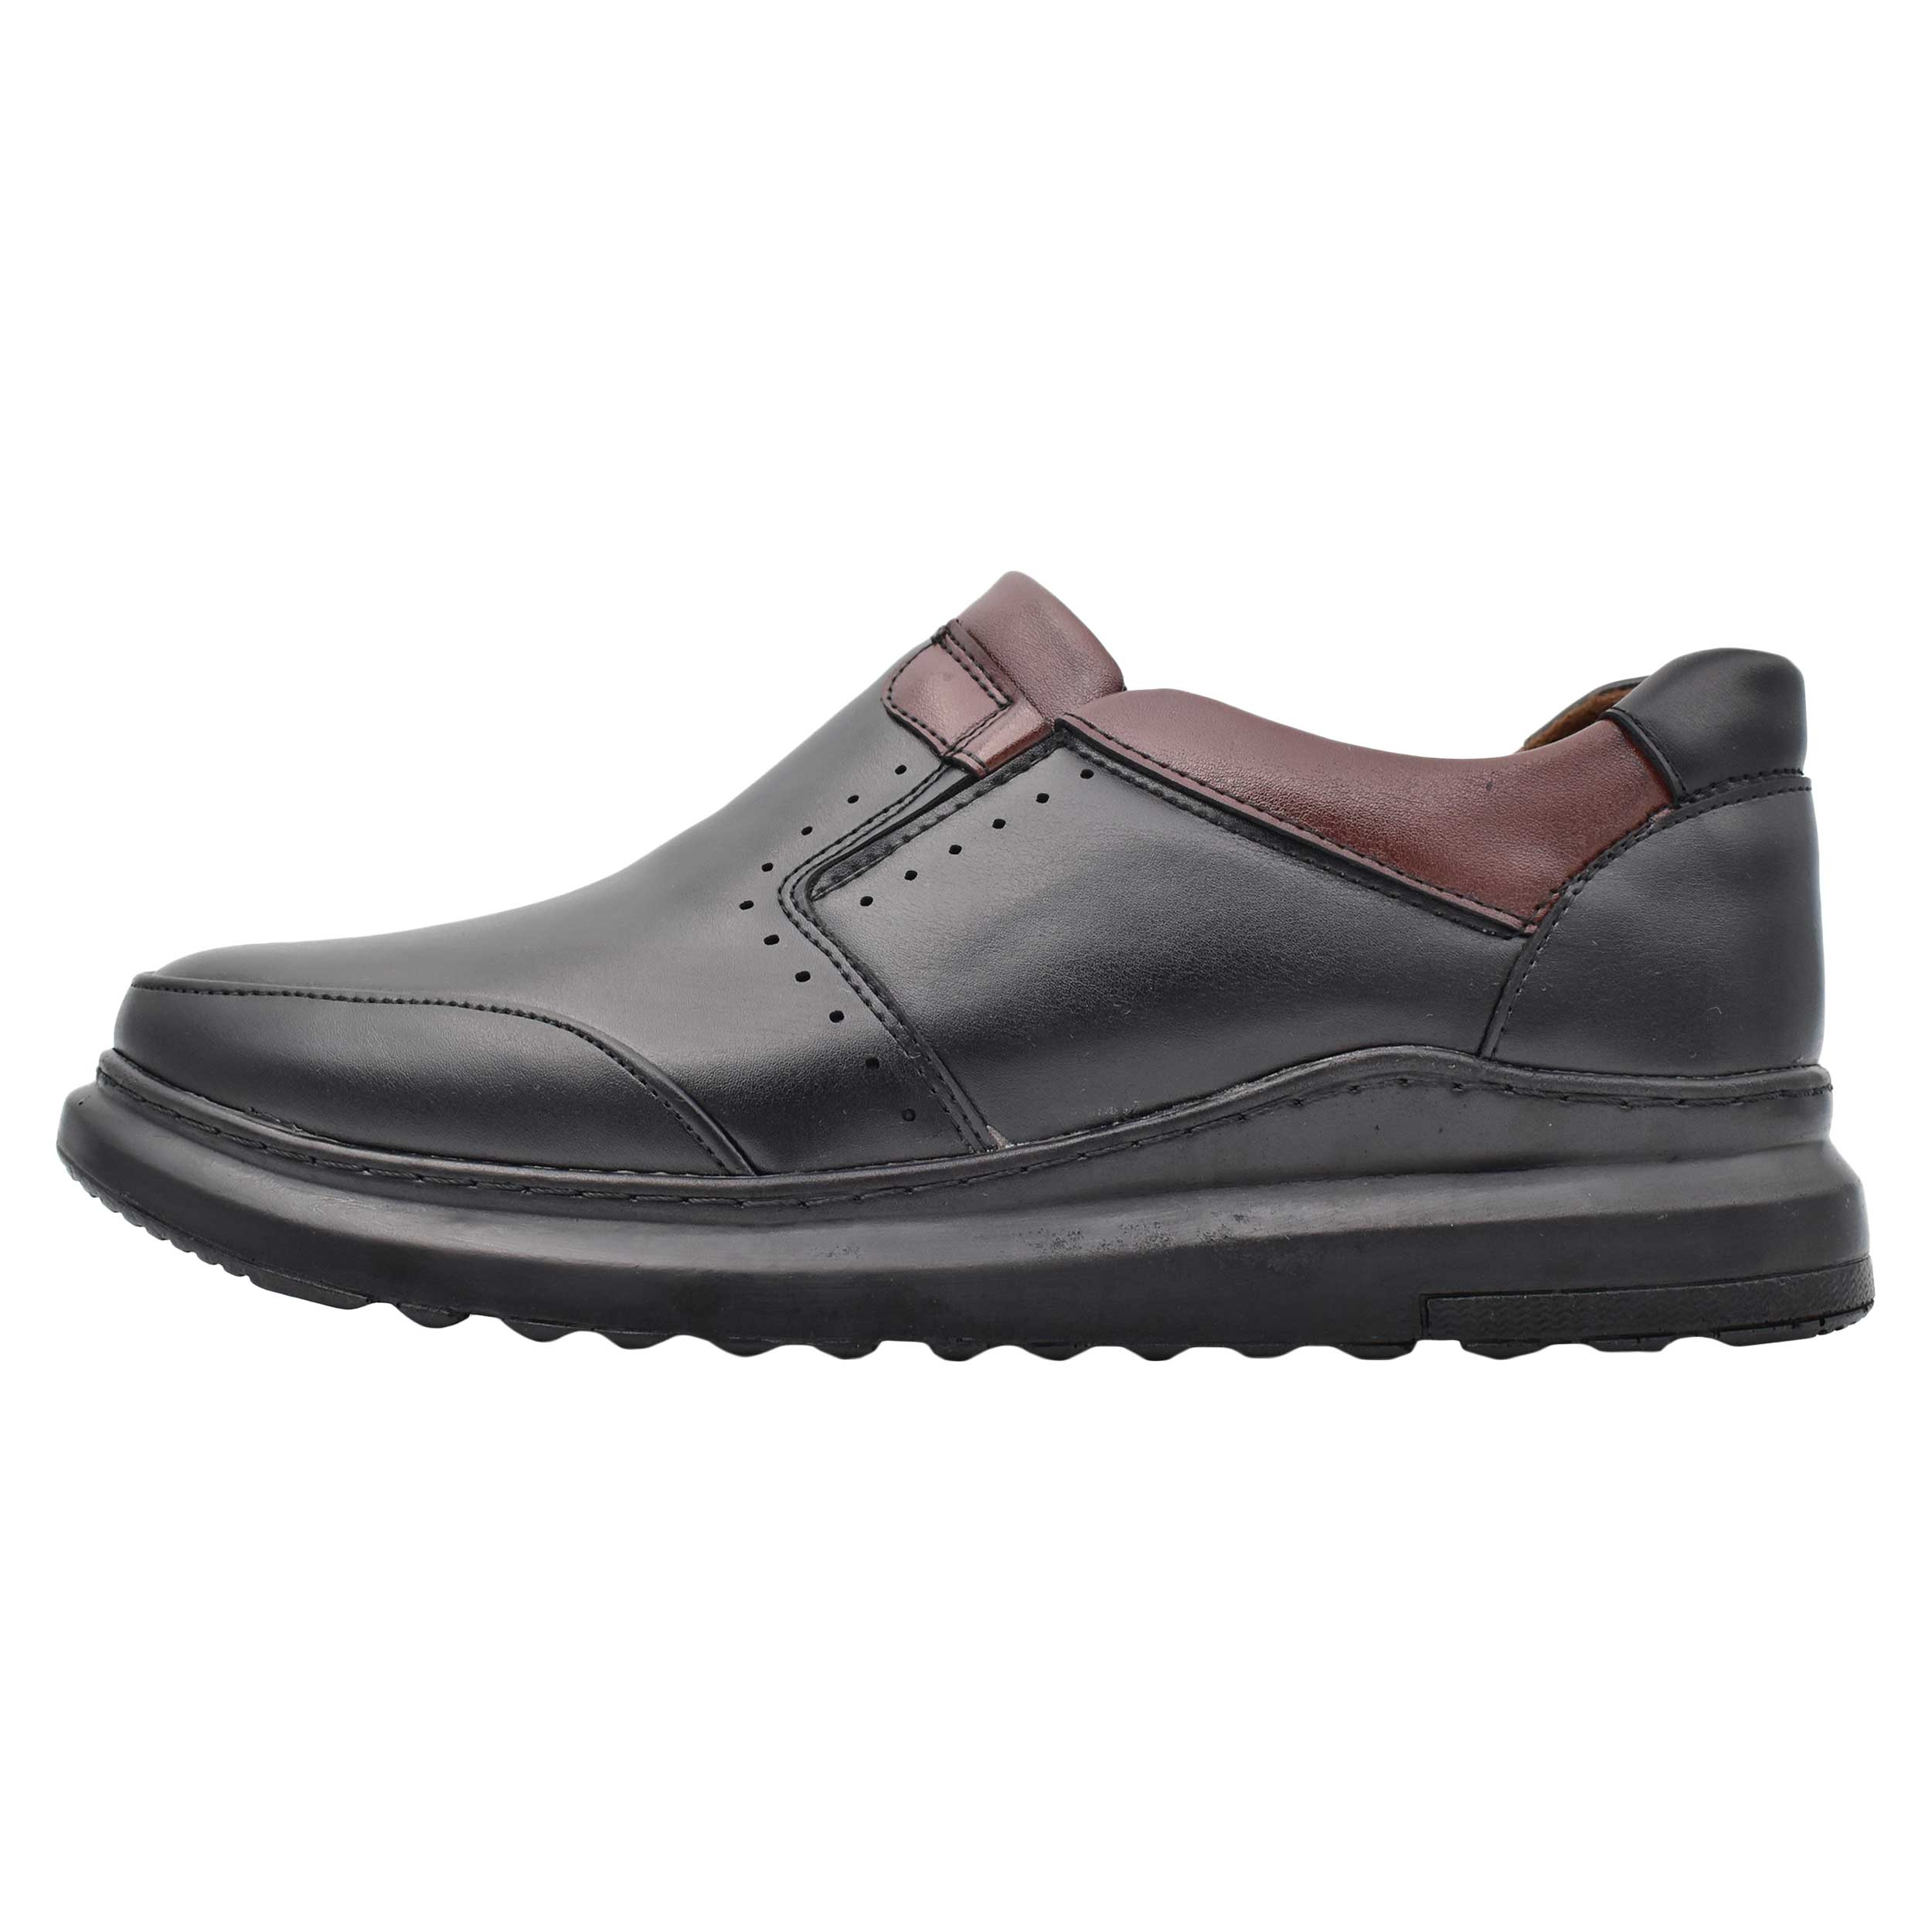 کفش روزمره مردانه مدل رویان کد 7526